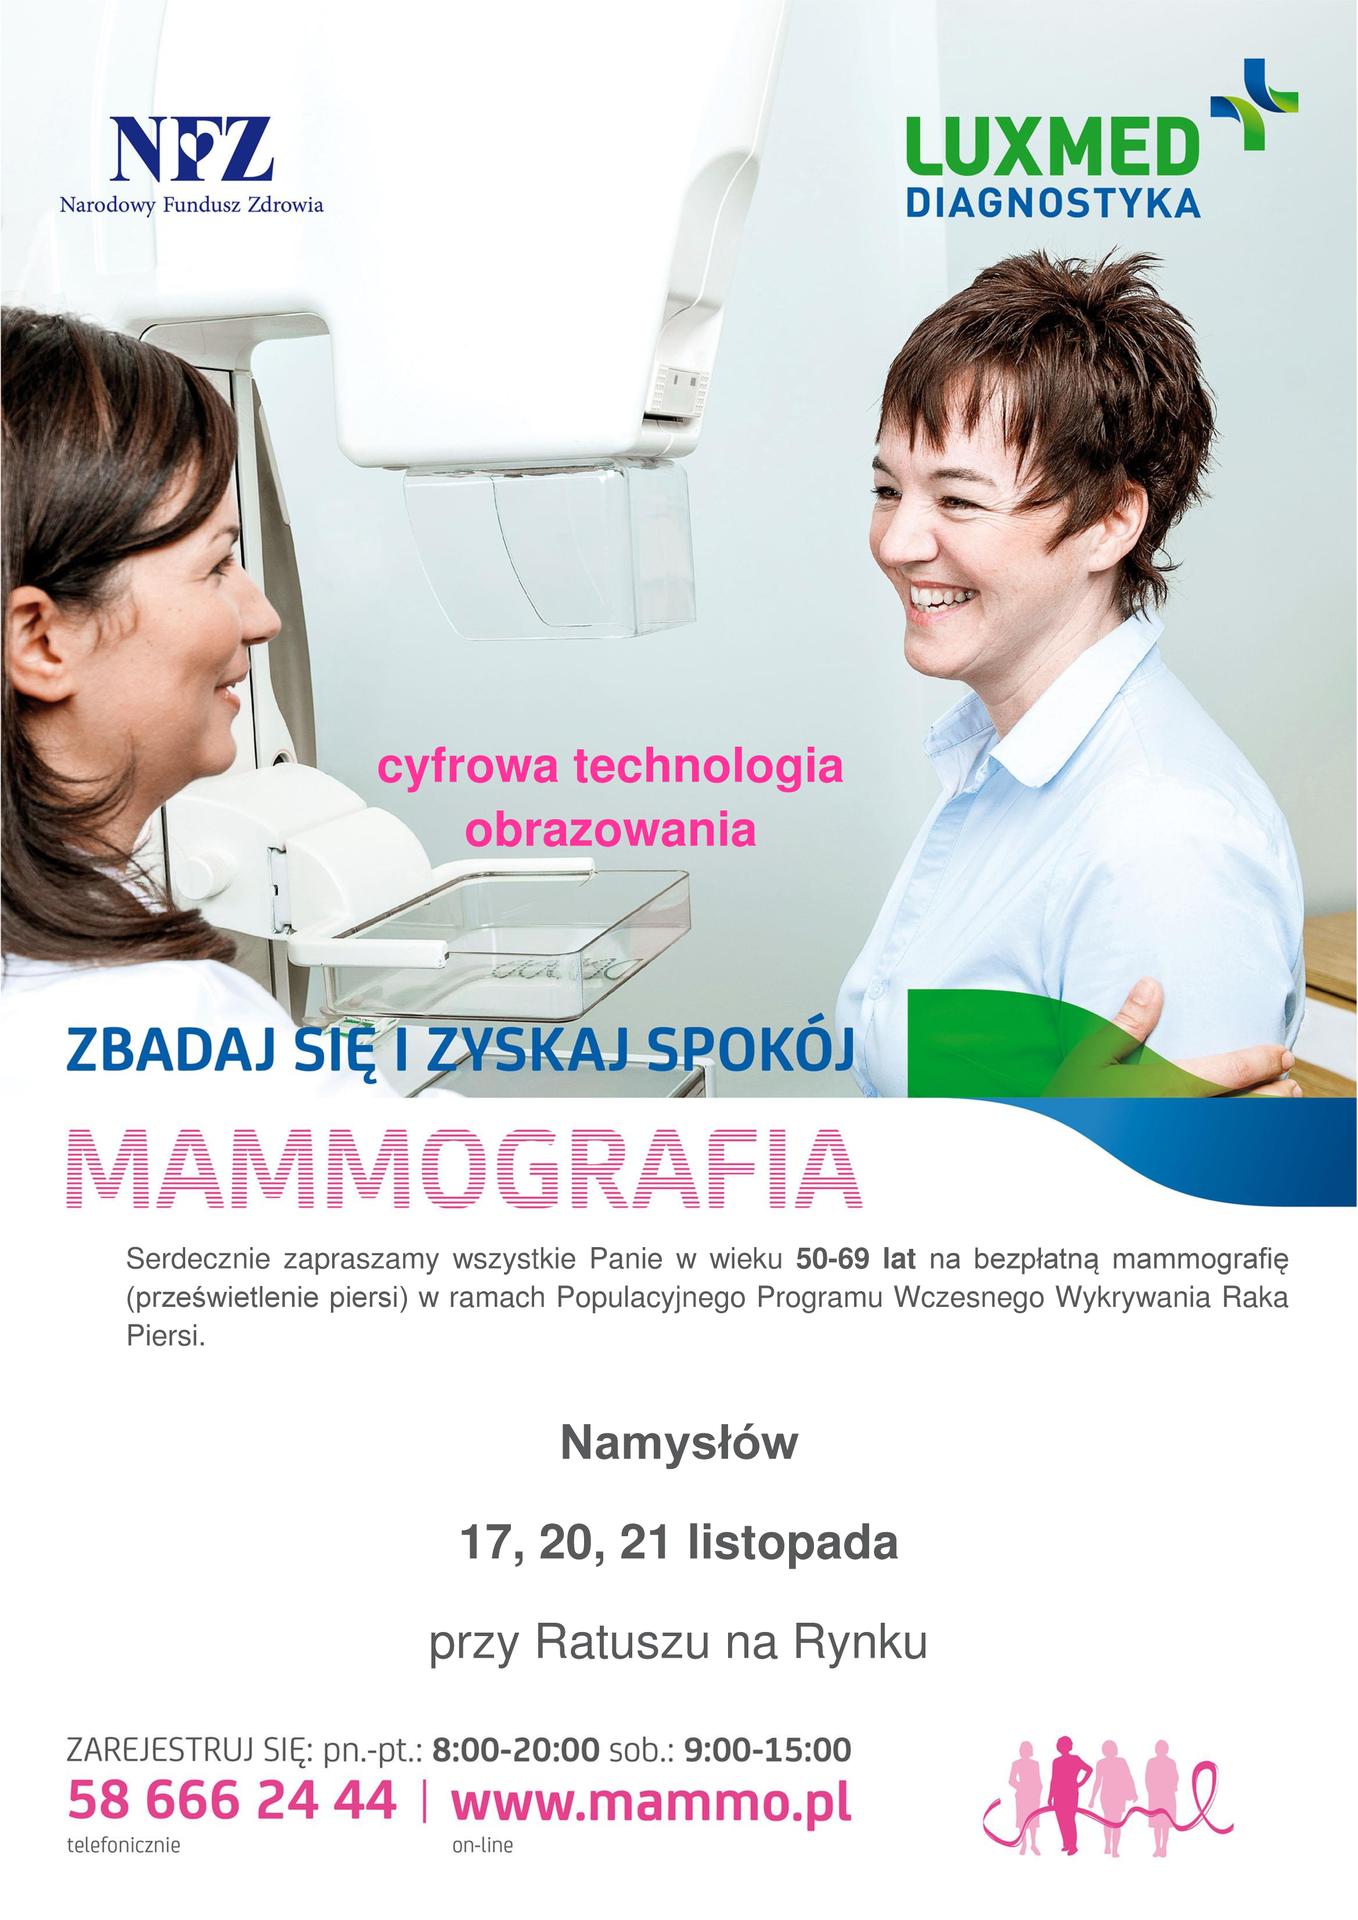 mammografia plakat pazdziernik.jpeg